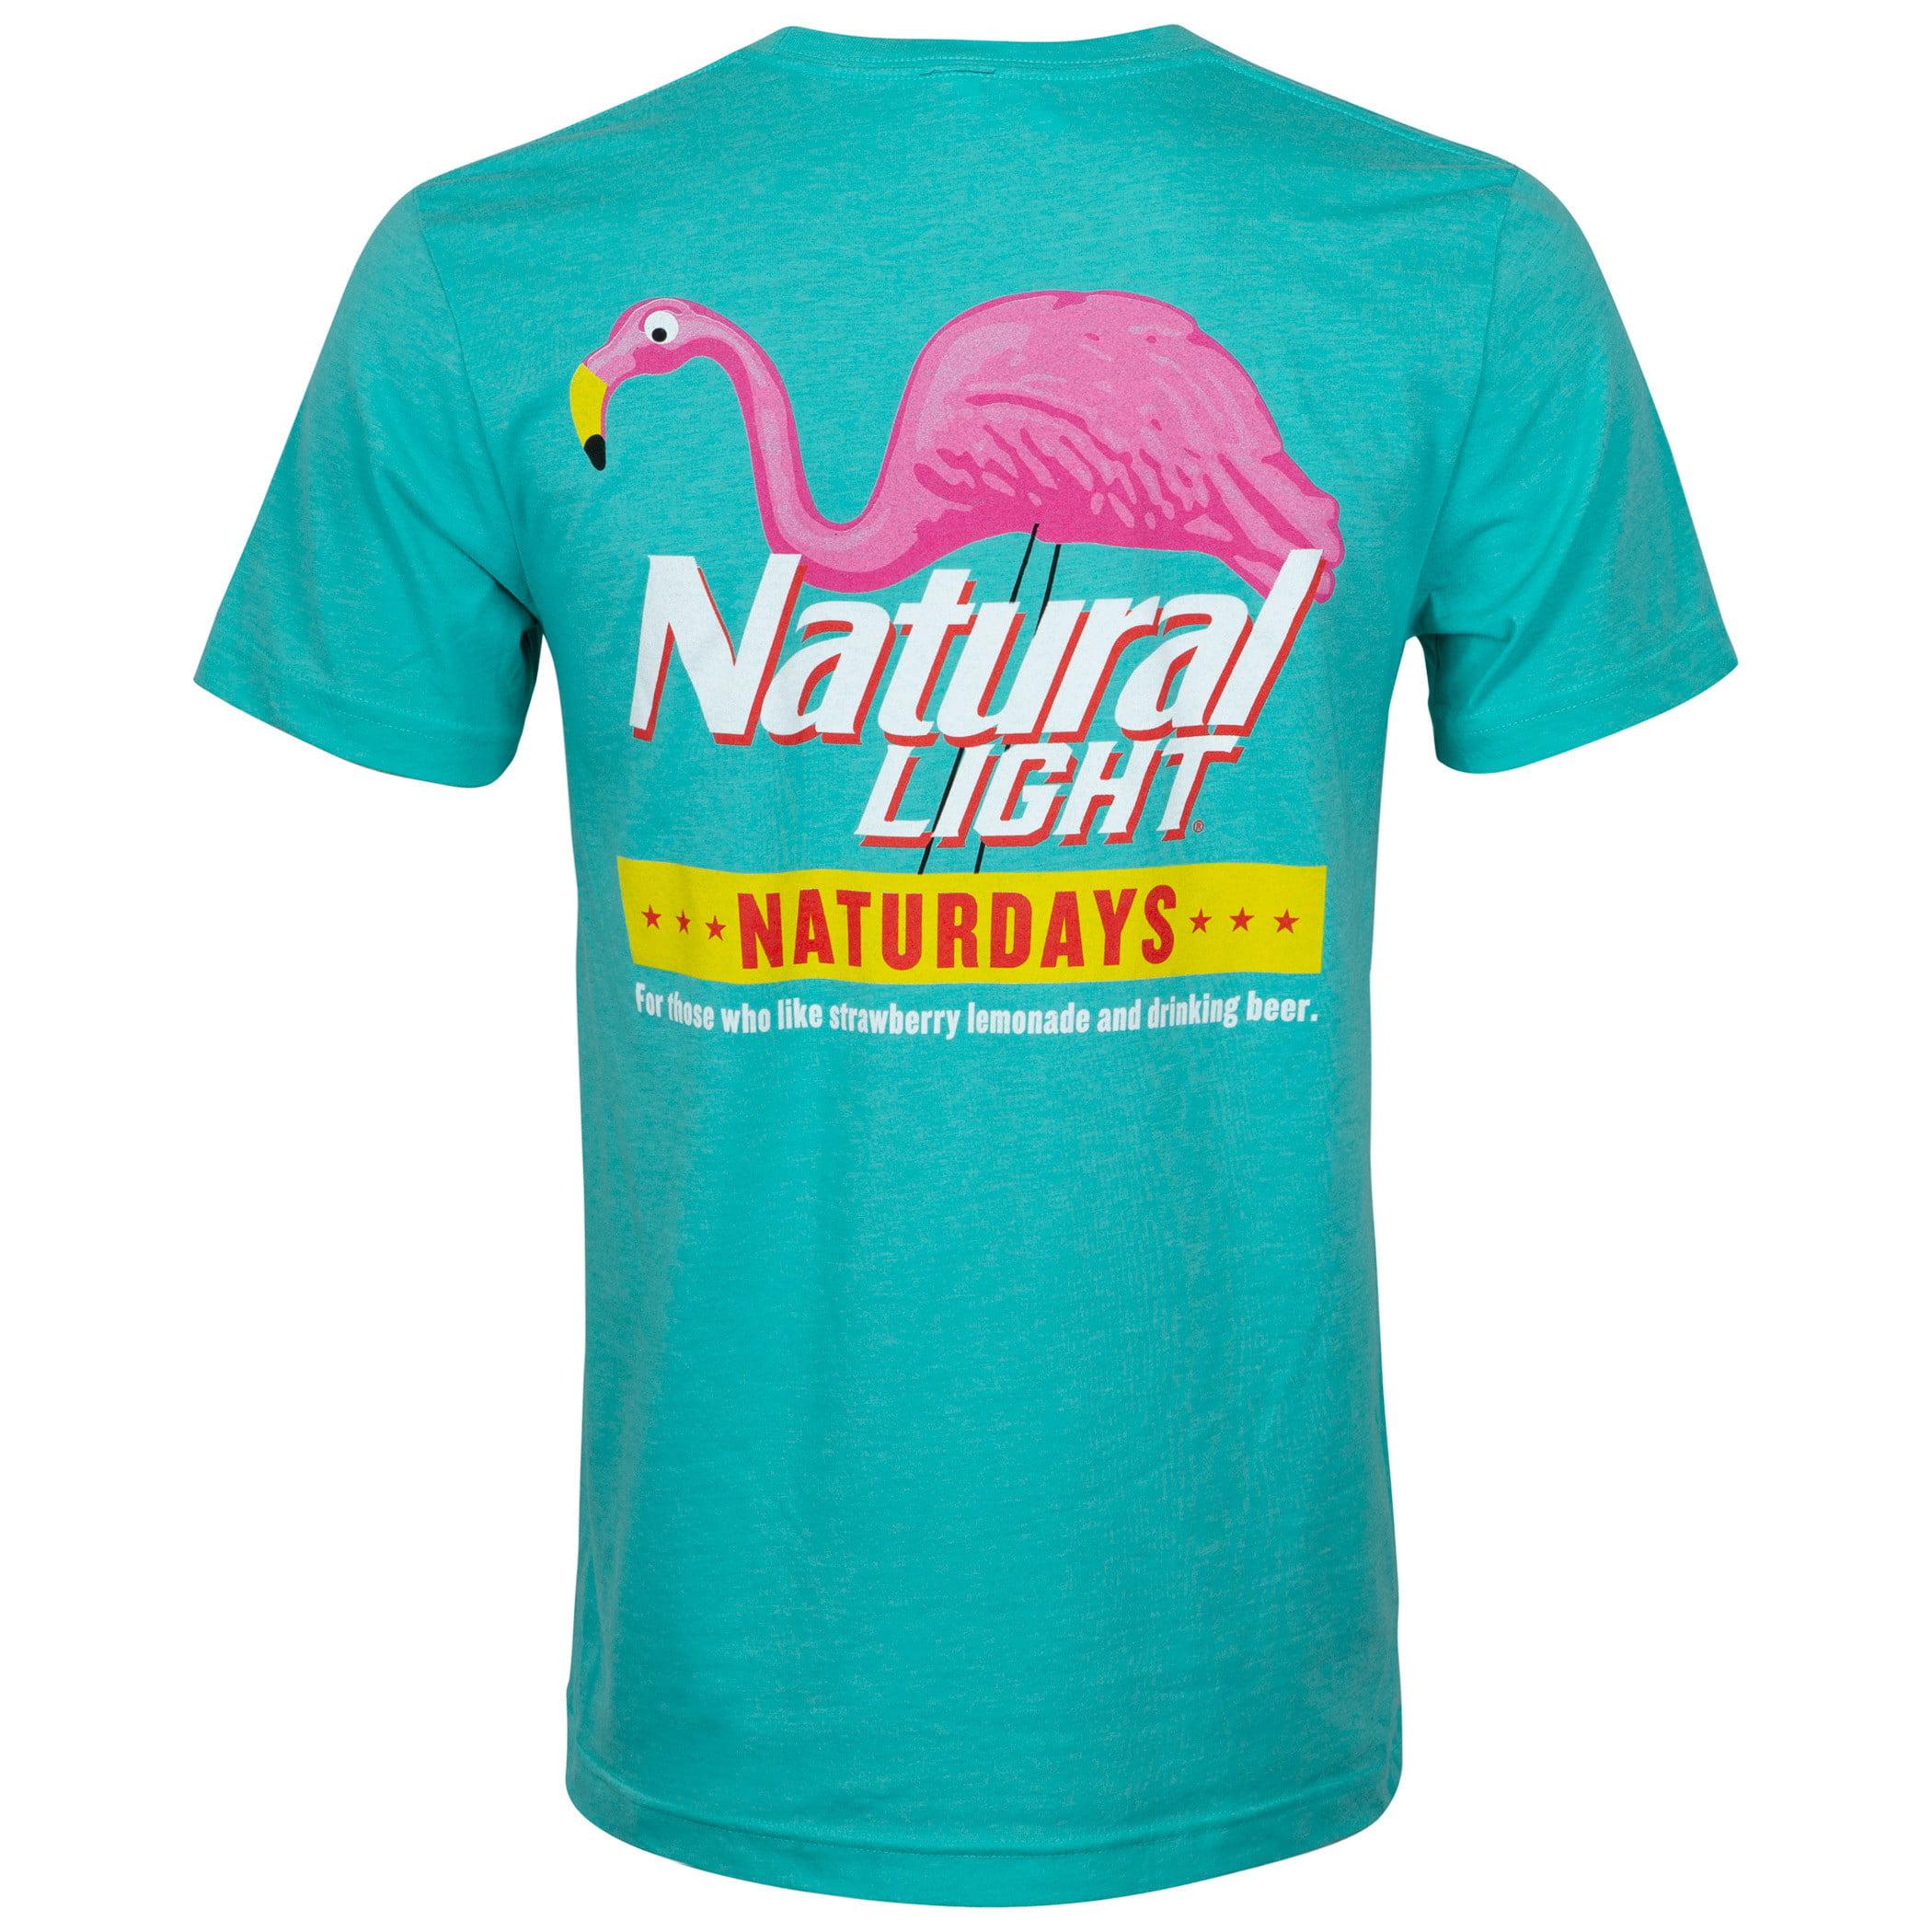 Natural Light Proud To Be An American Navy Pocket Tee Shirt Blue